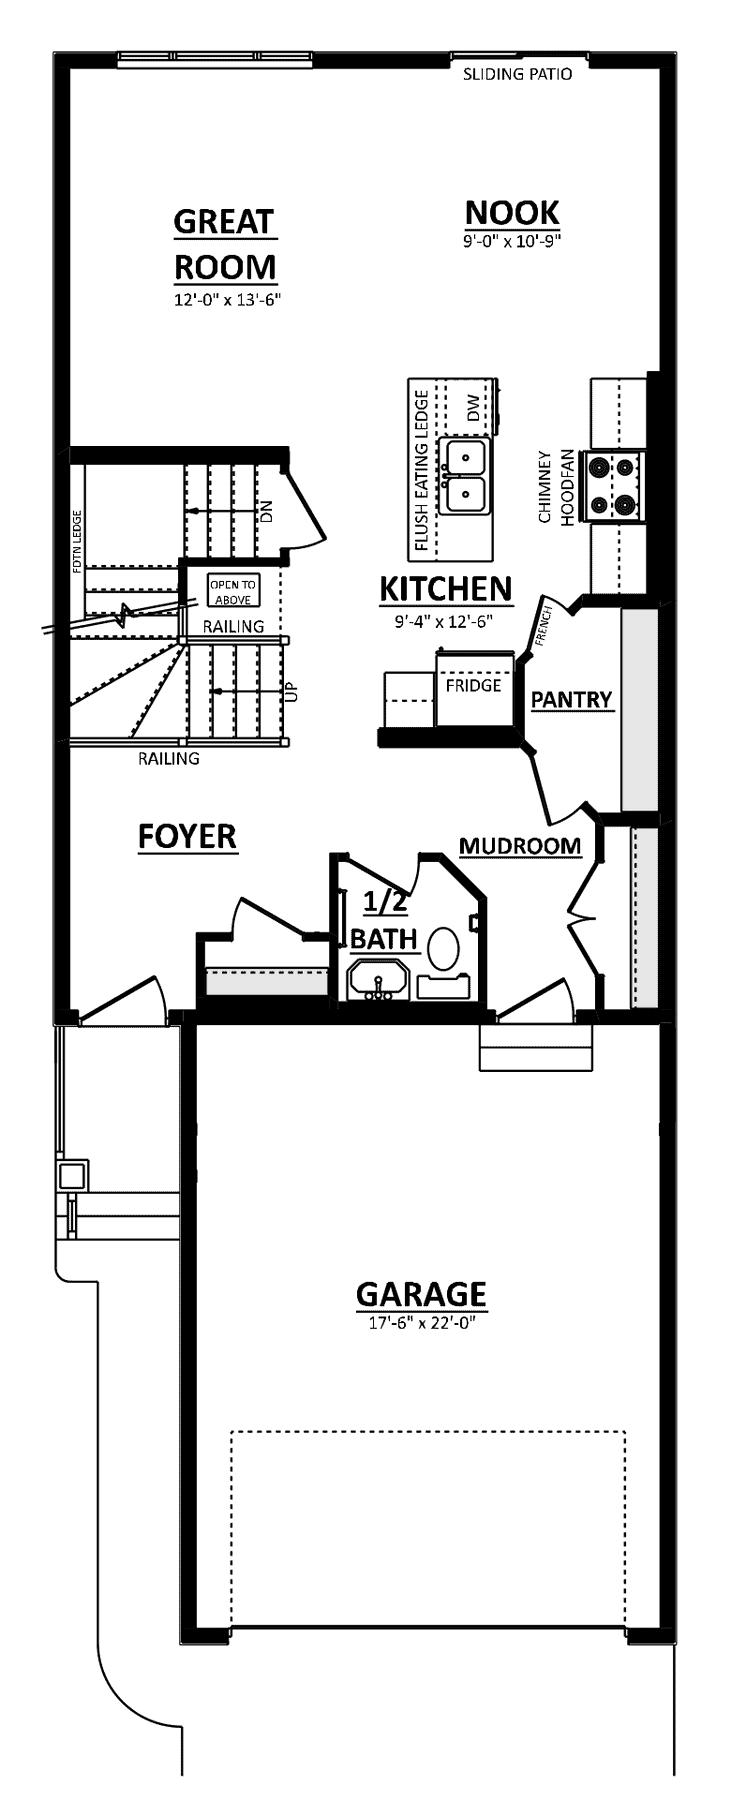 sophia b main floor 09 2021